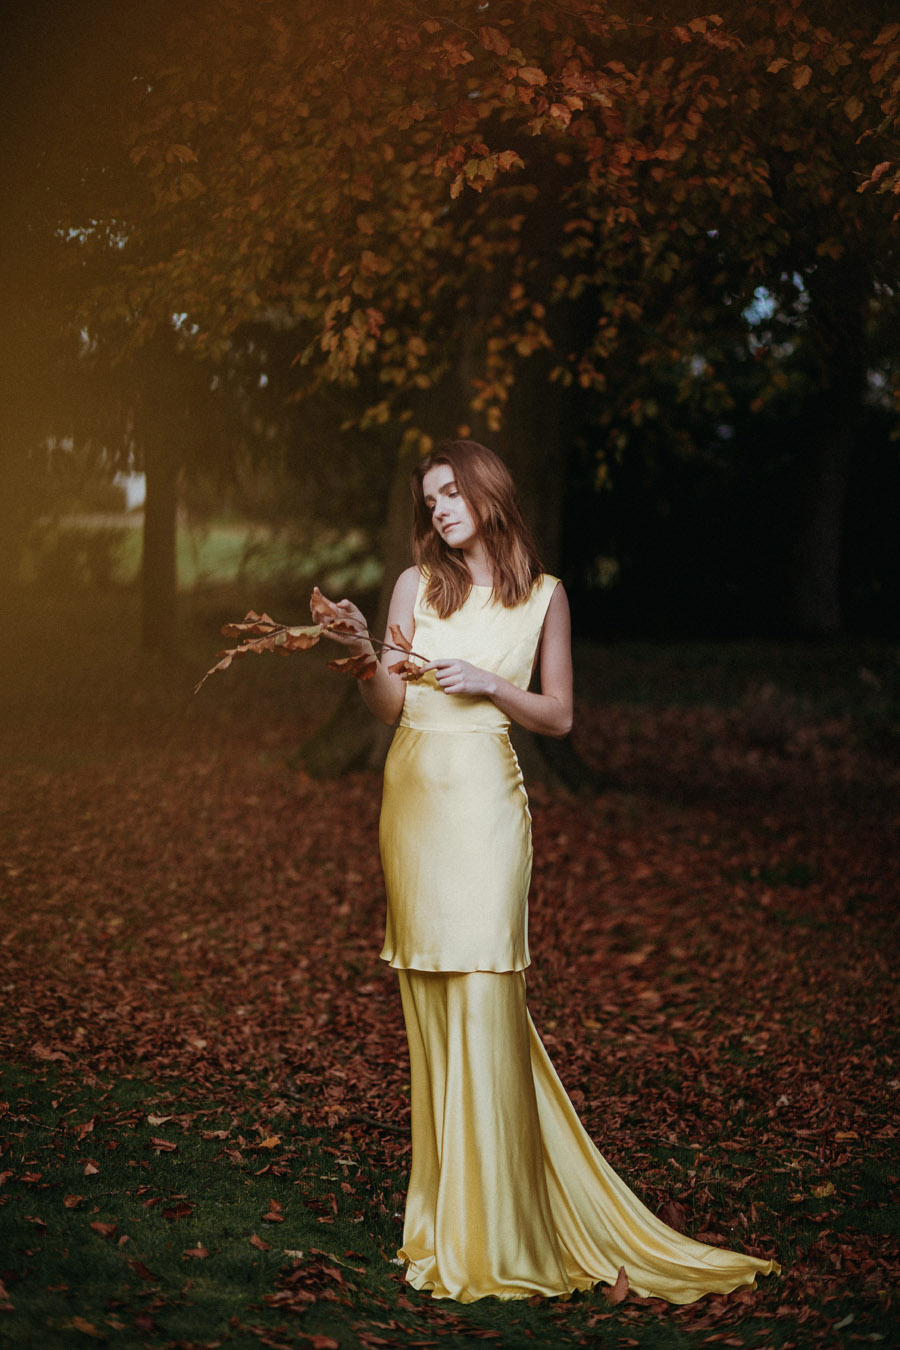 Sanyukta Shrestha autumn daydream bridal collection 2020 (23)